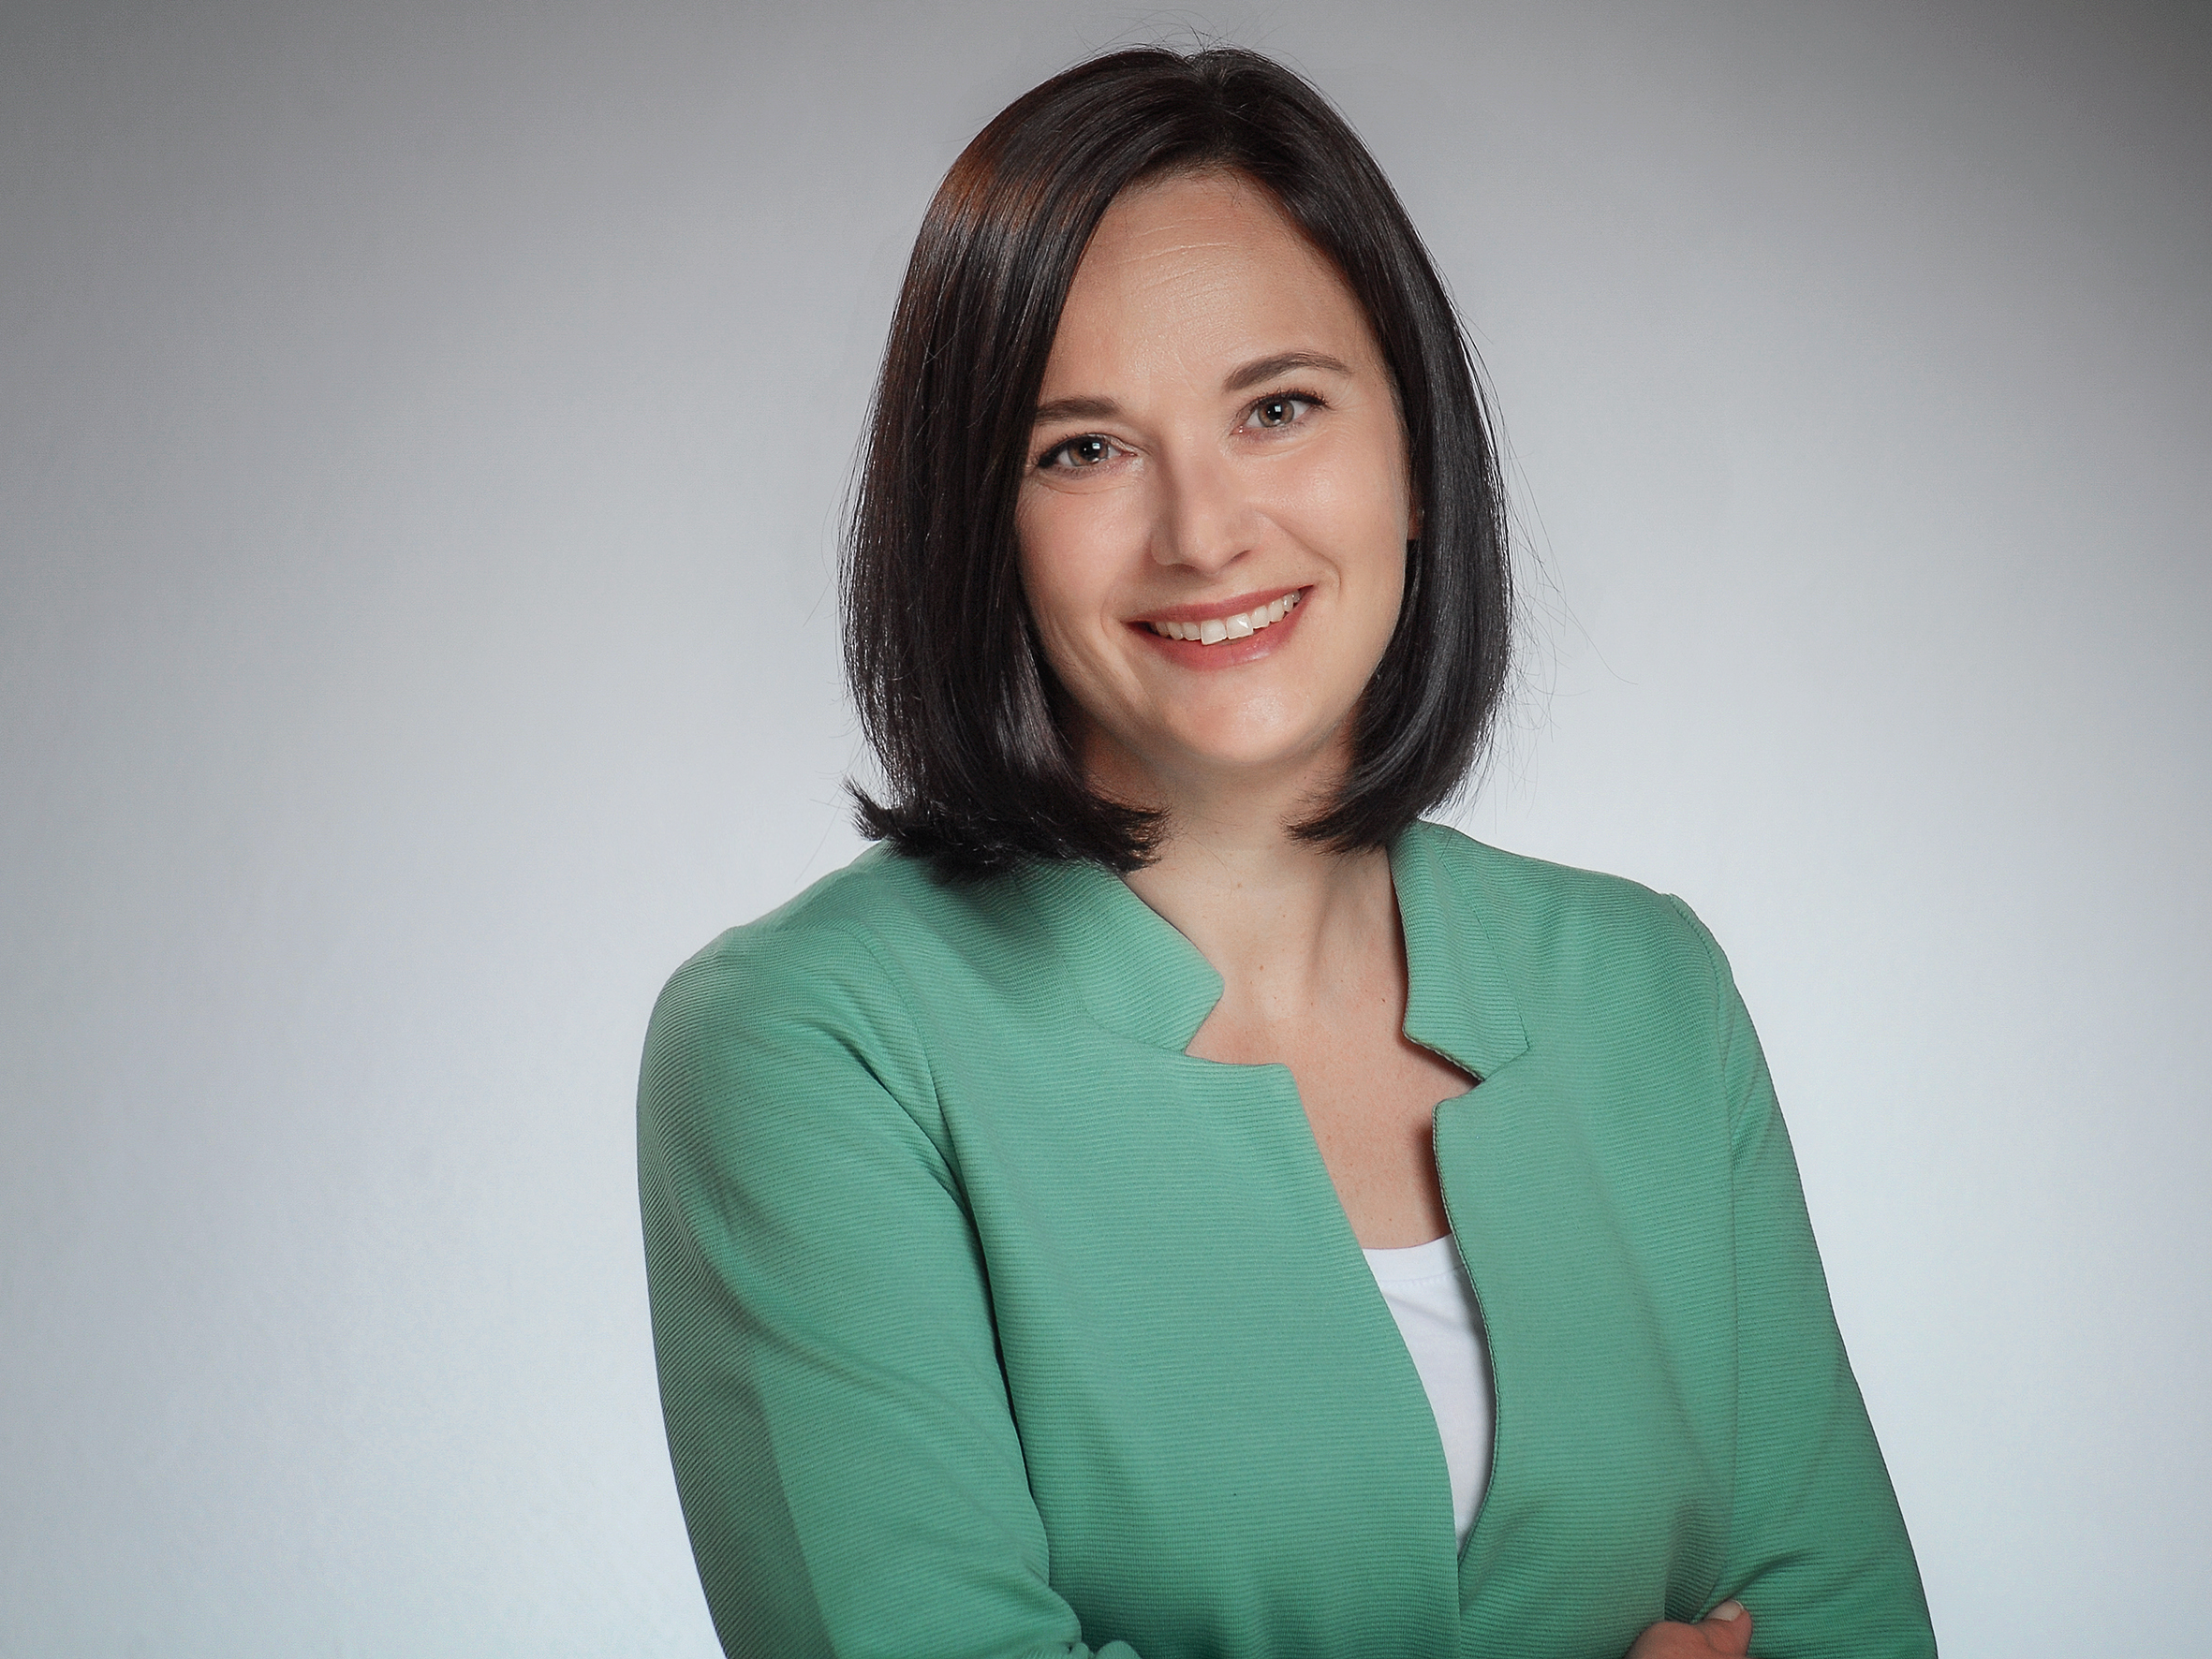 Julia Monnier